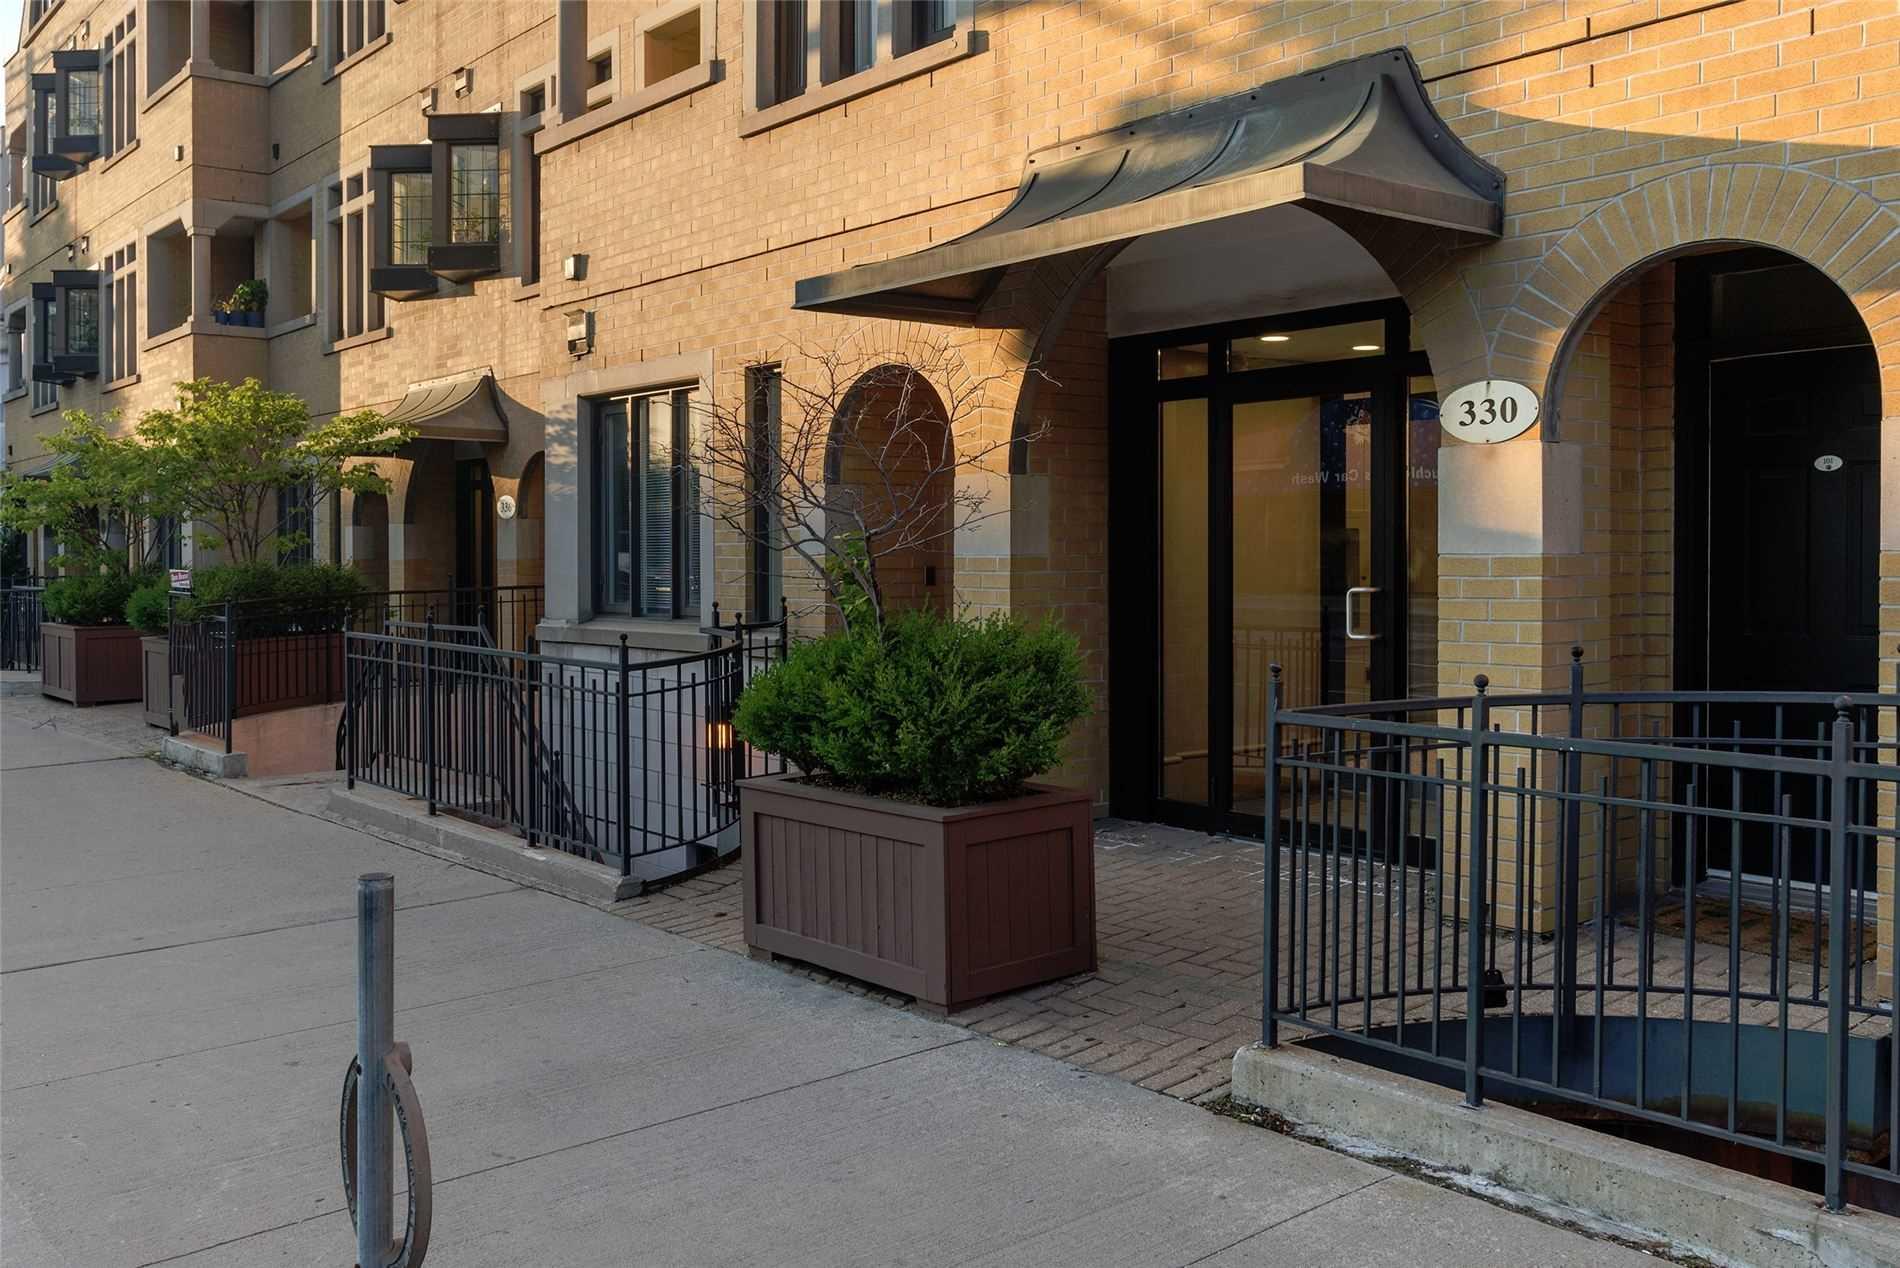 338 Davenport Rd, Toronto